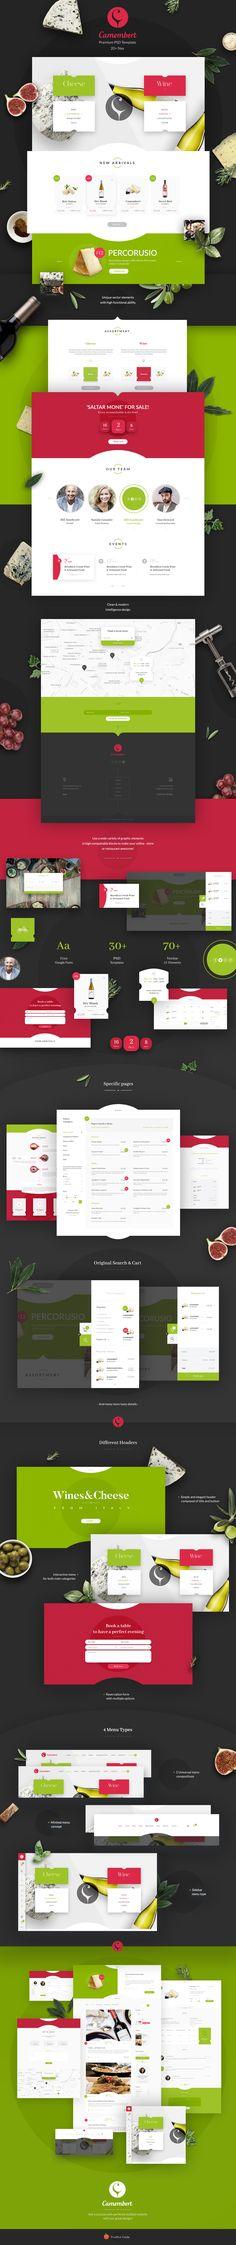 Camembert - ultimate WordPress theme on Behance